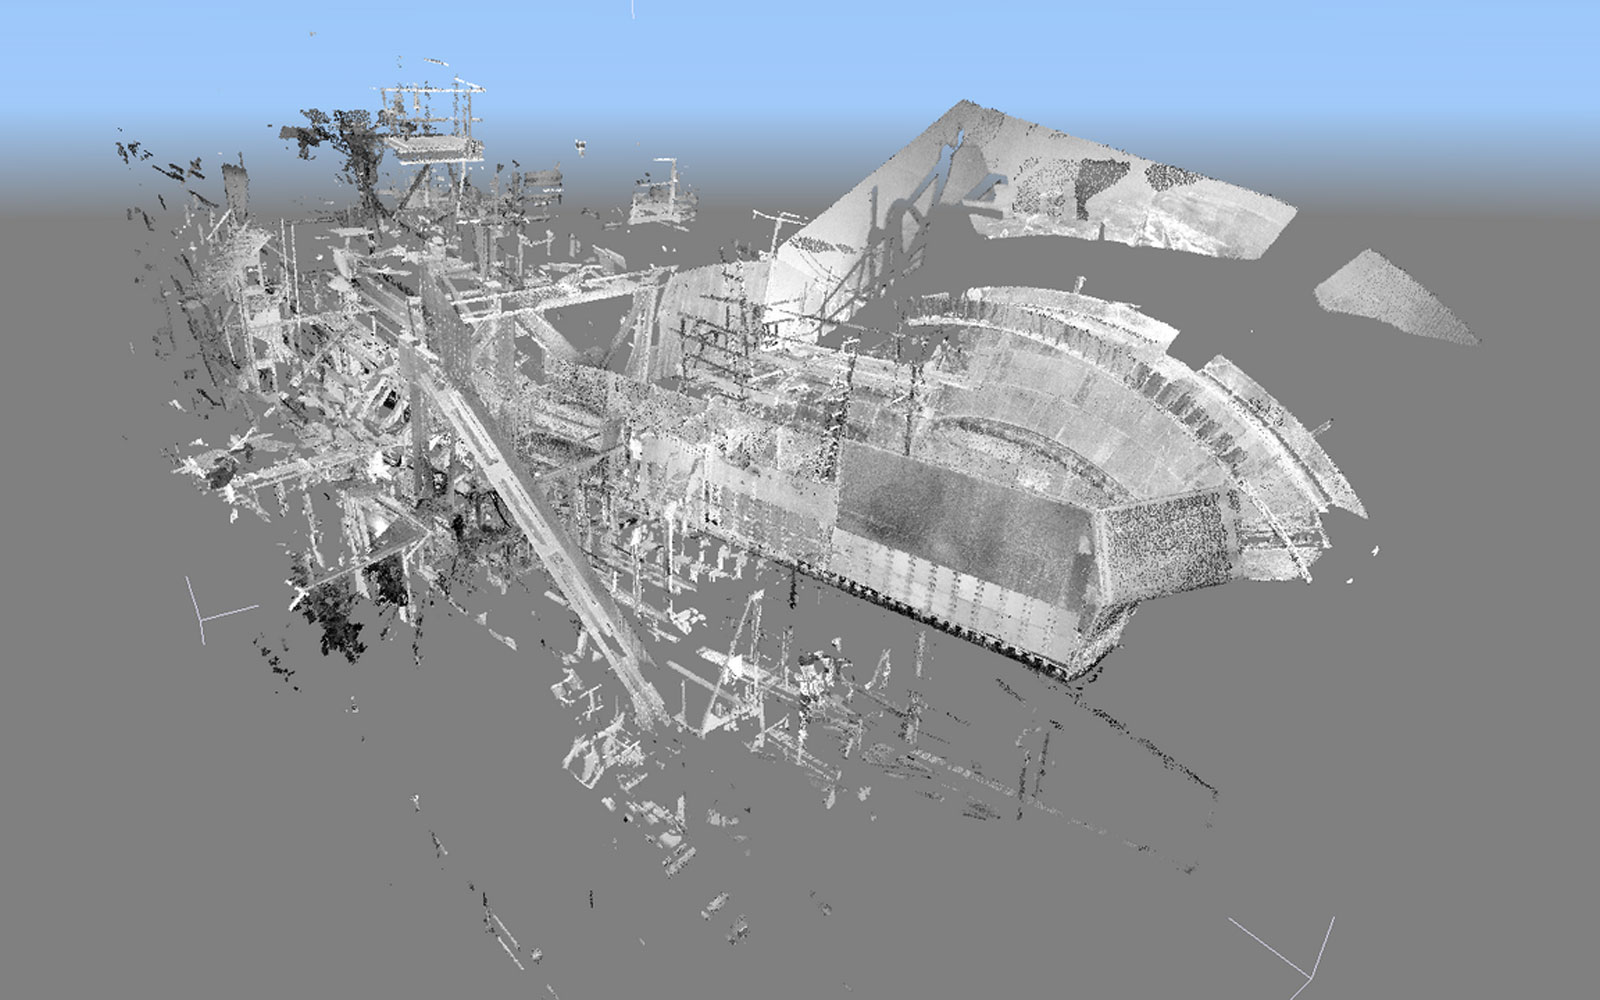 Conap 3D Scanning Services - Band eines Schaufelradbaggers